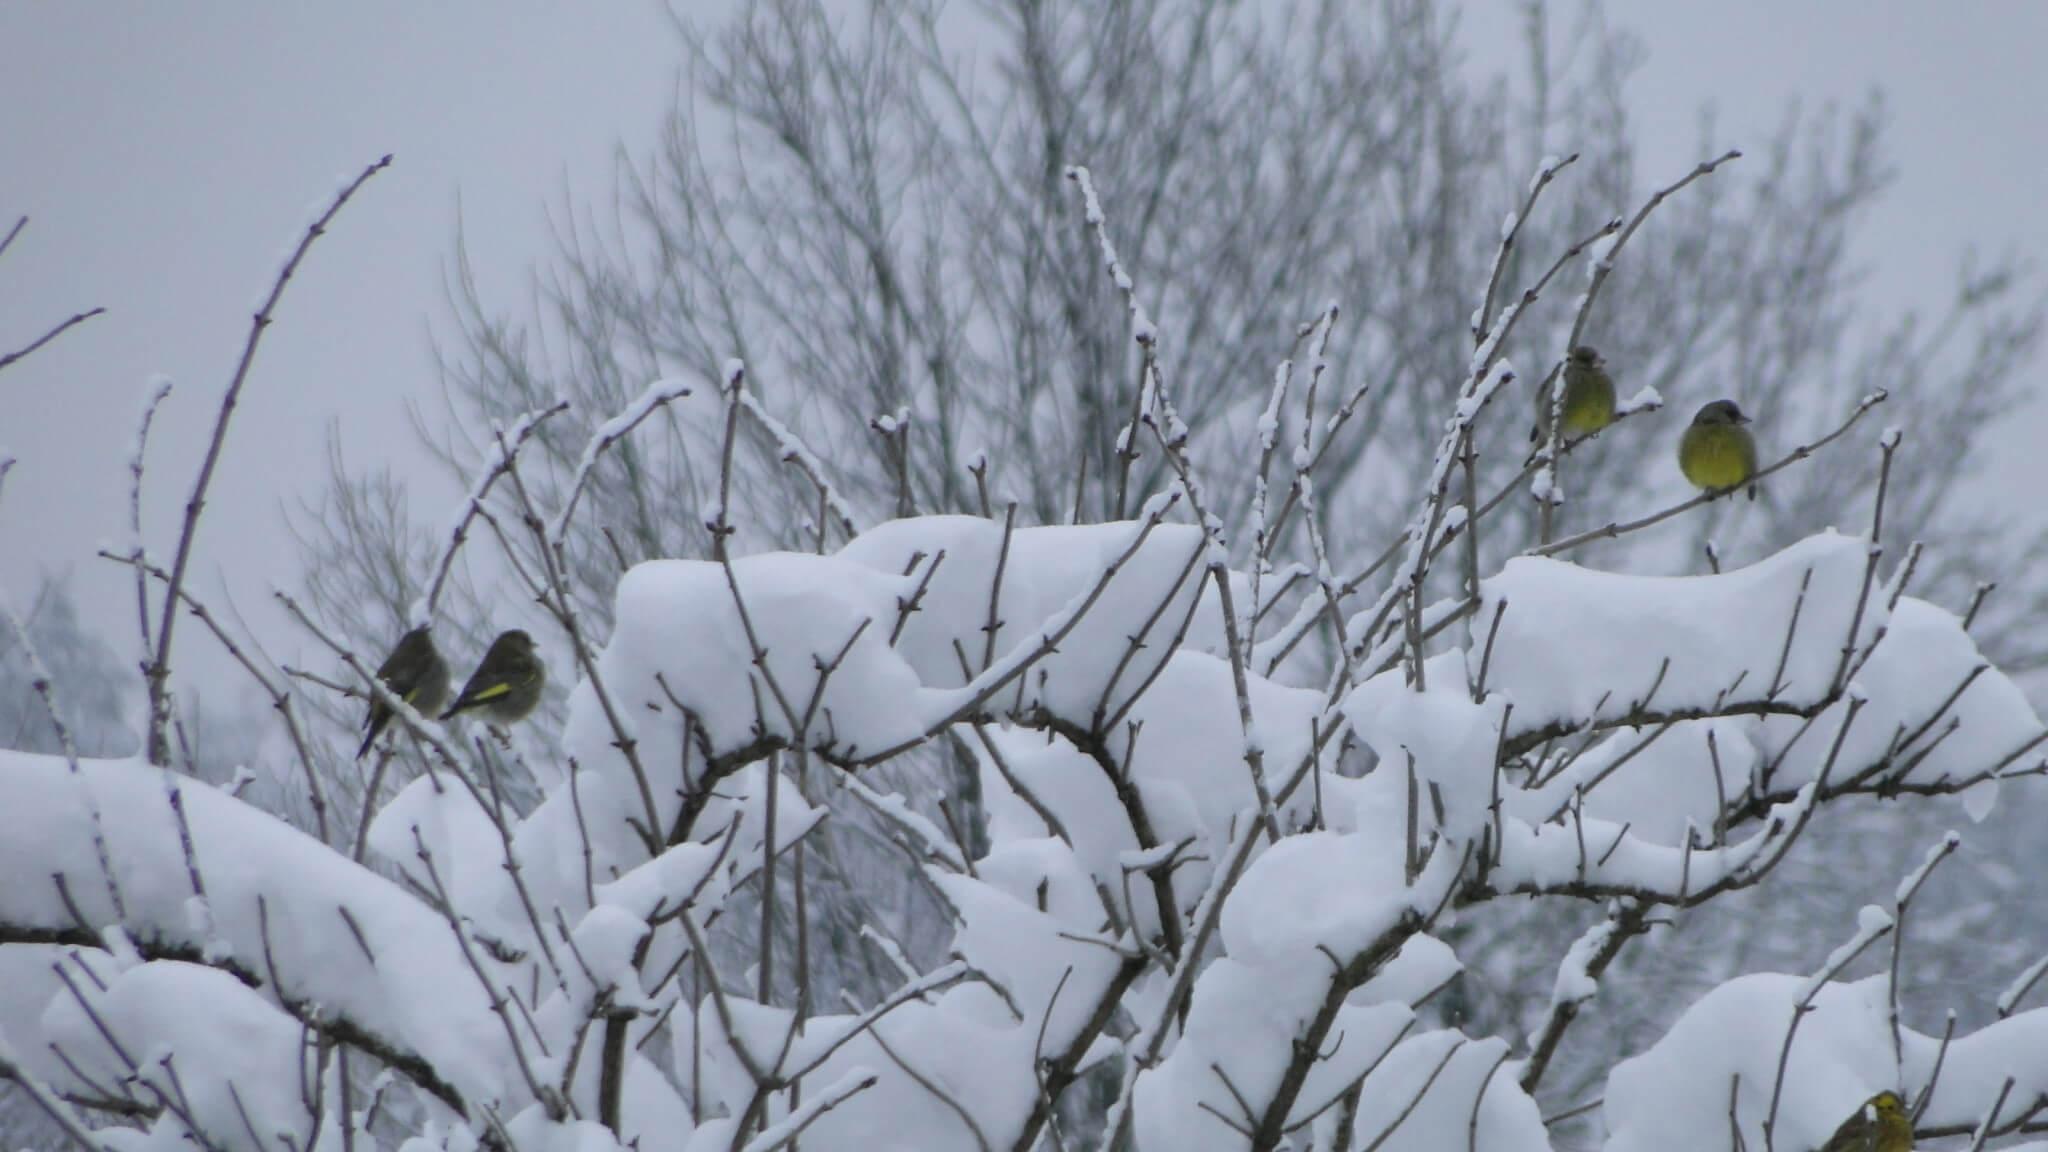 Lutowa zima - śnieżna i mroźna 1